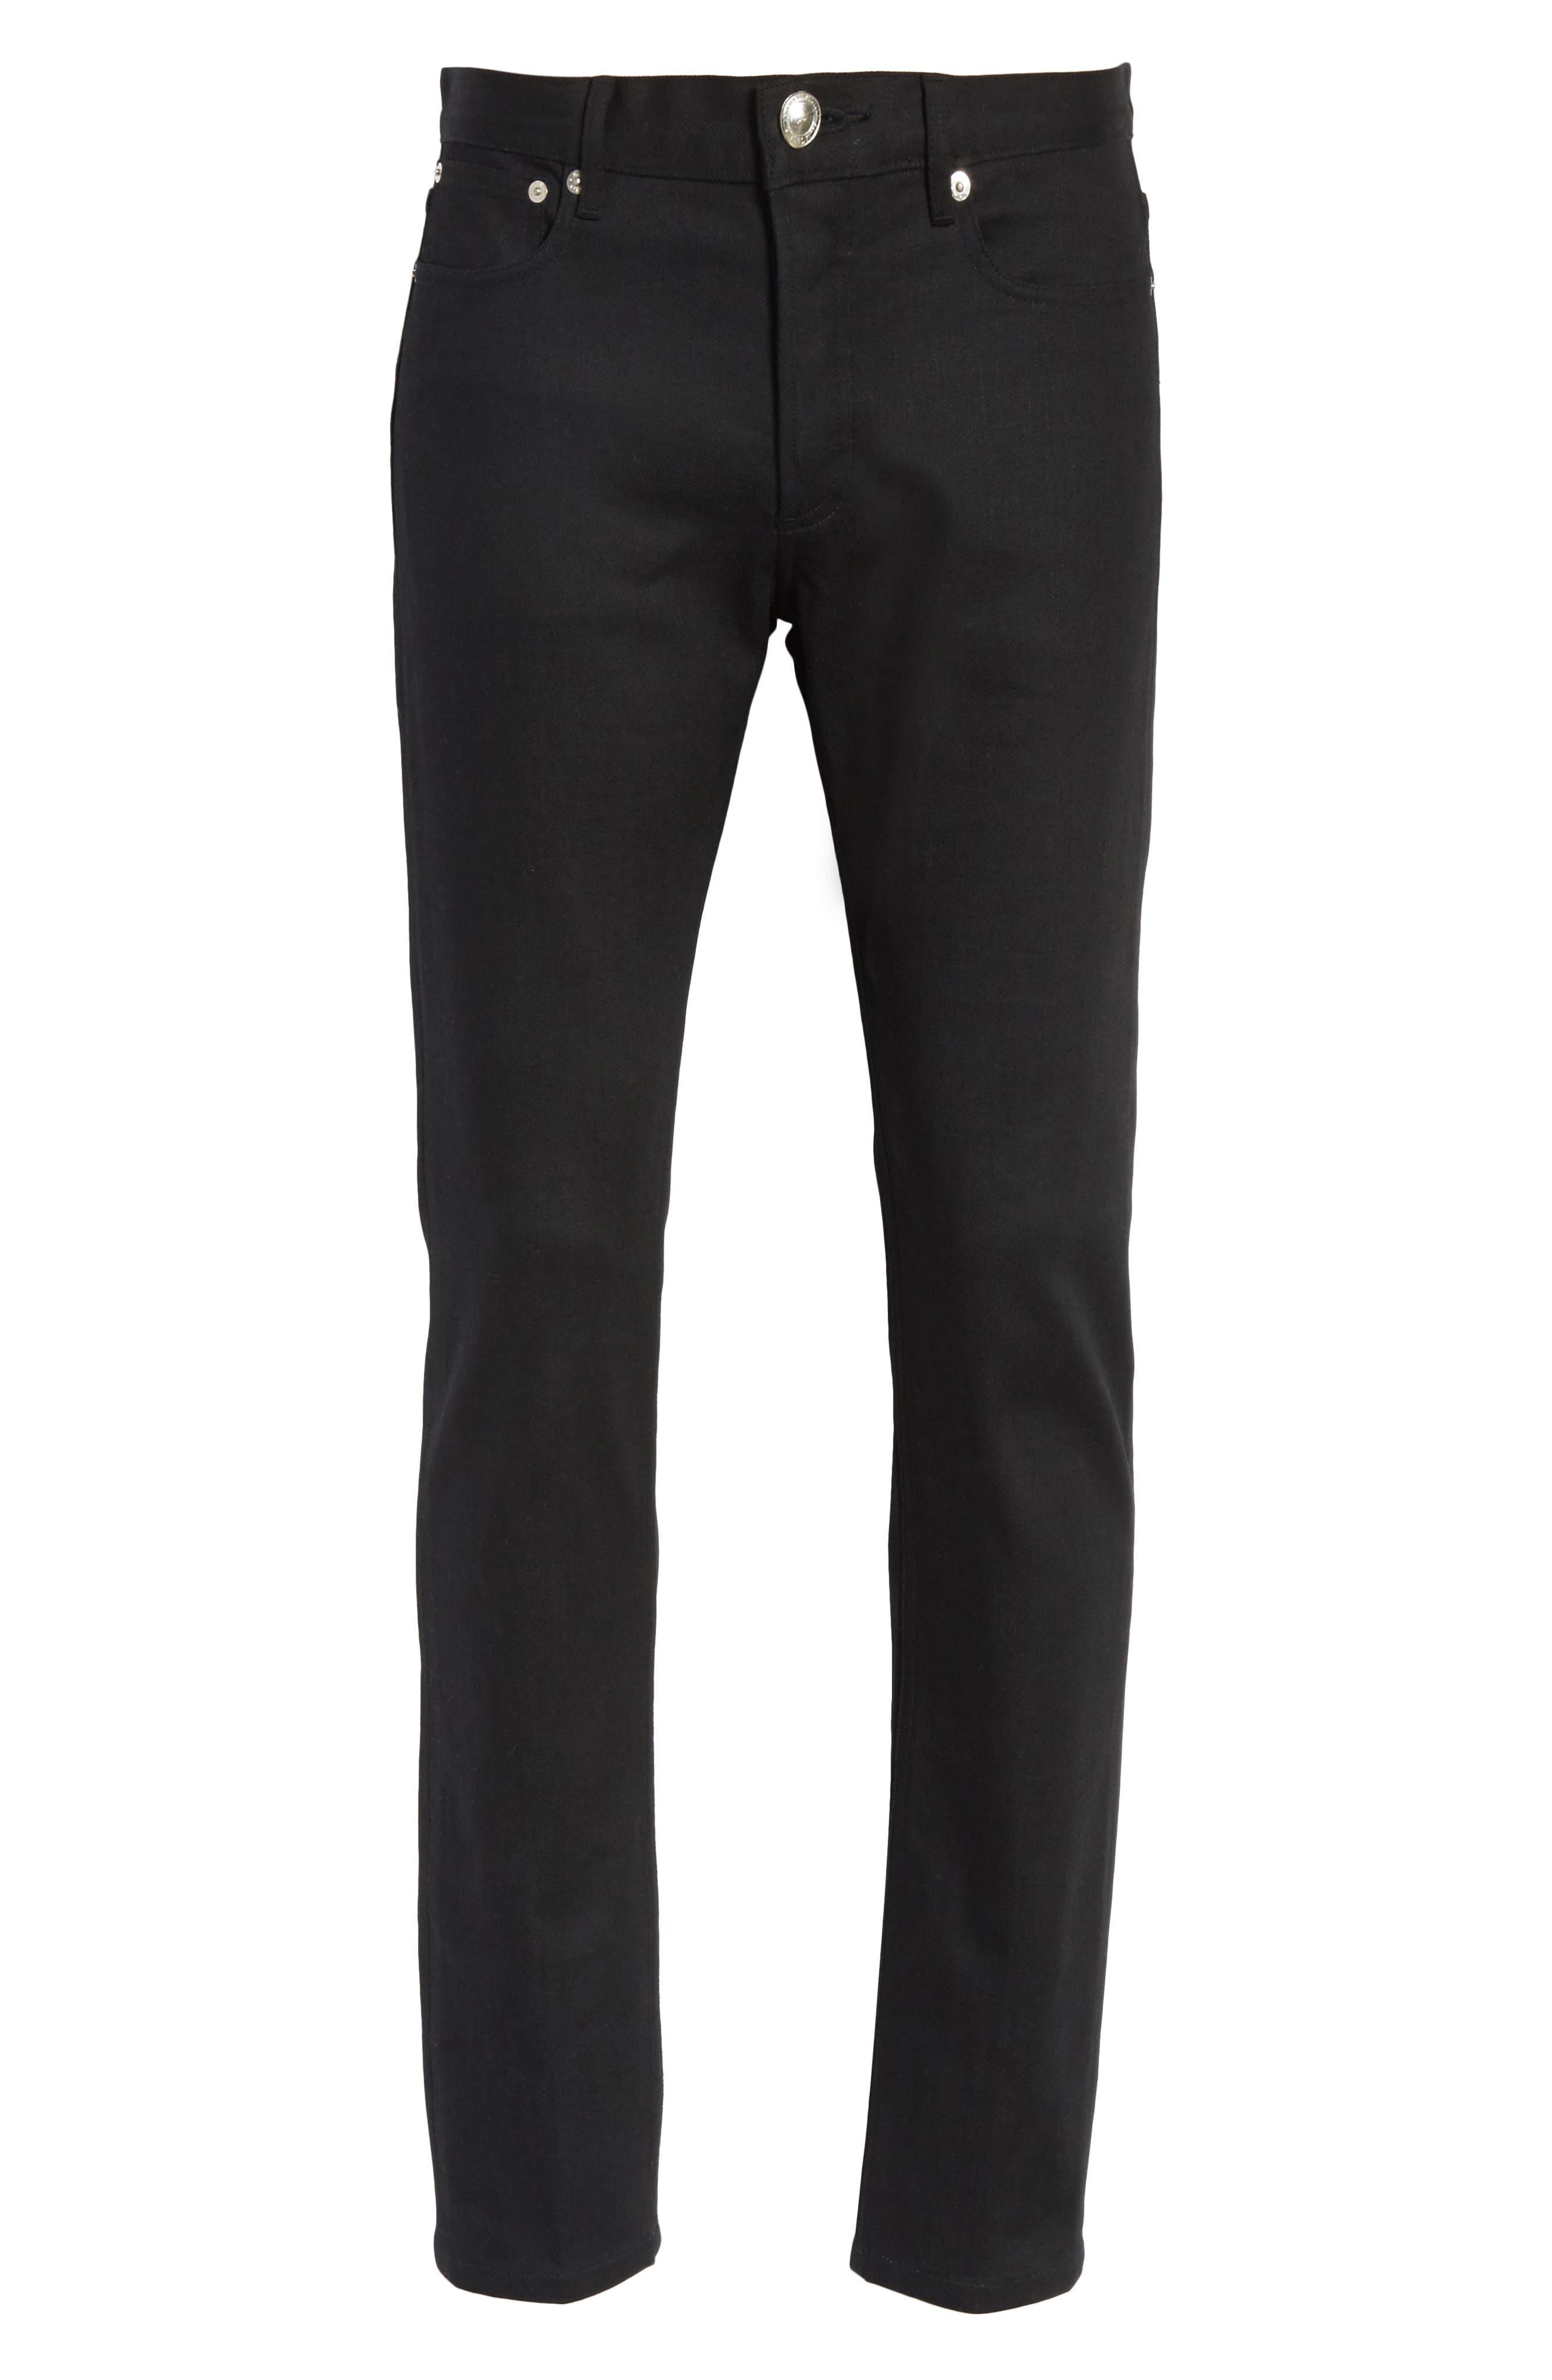 Petit New Standard Stretch Skinny Fit Jeans,                             Alternate thumbnail 6, color,                             BLACK